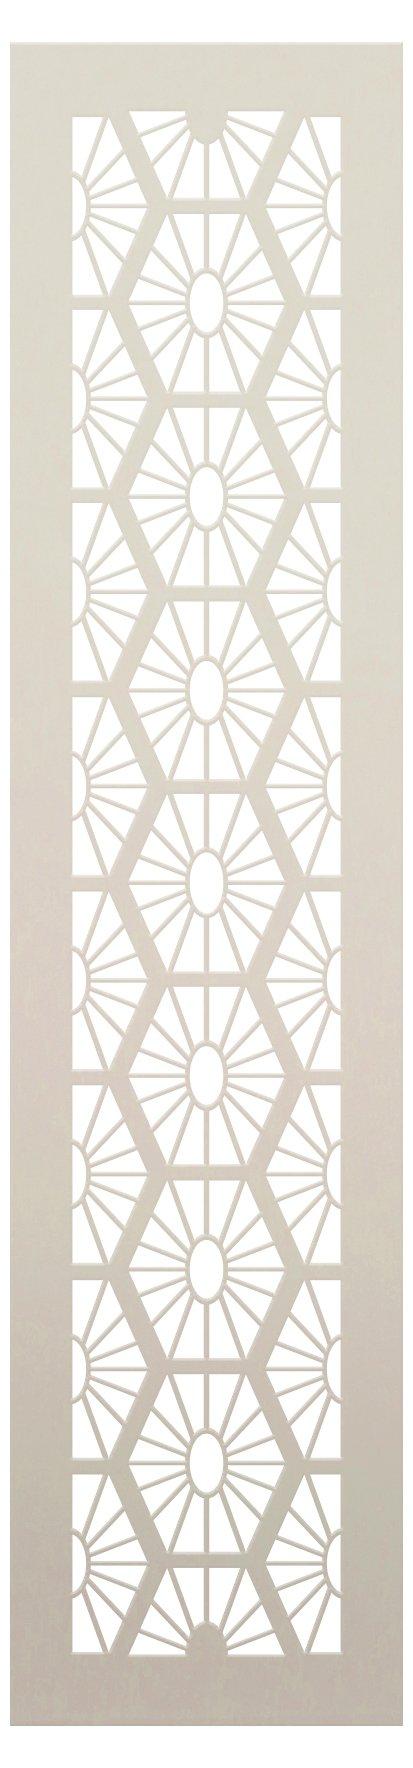 Chinese Elongated Sunburst Hexagon Band Stencil by StudioR12 | Craft DIY Sun Backsplash Pattern Home Decor | Paint Wood Sign Border | Select Size